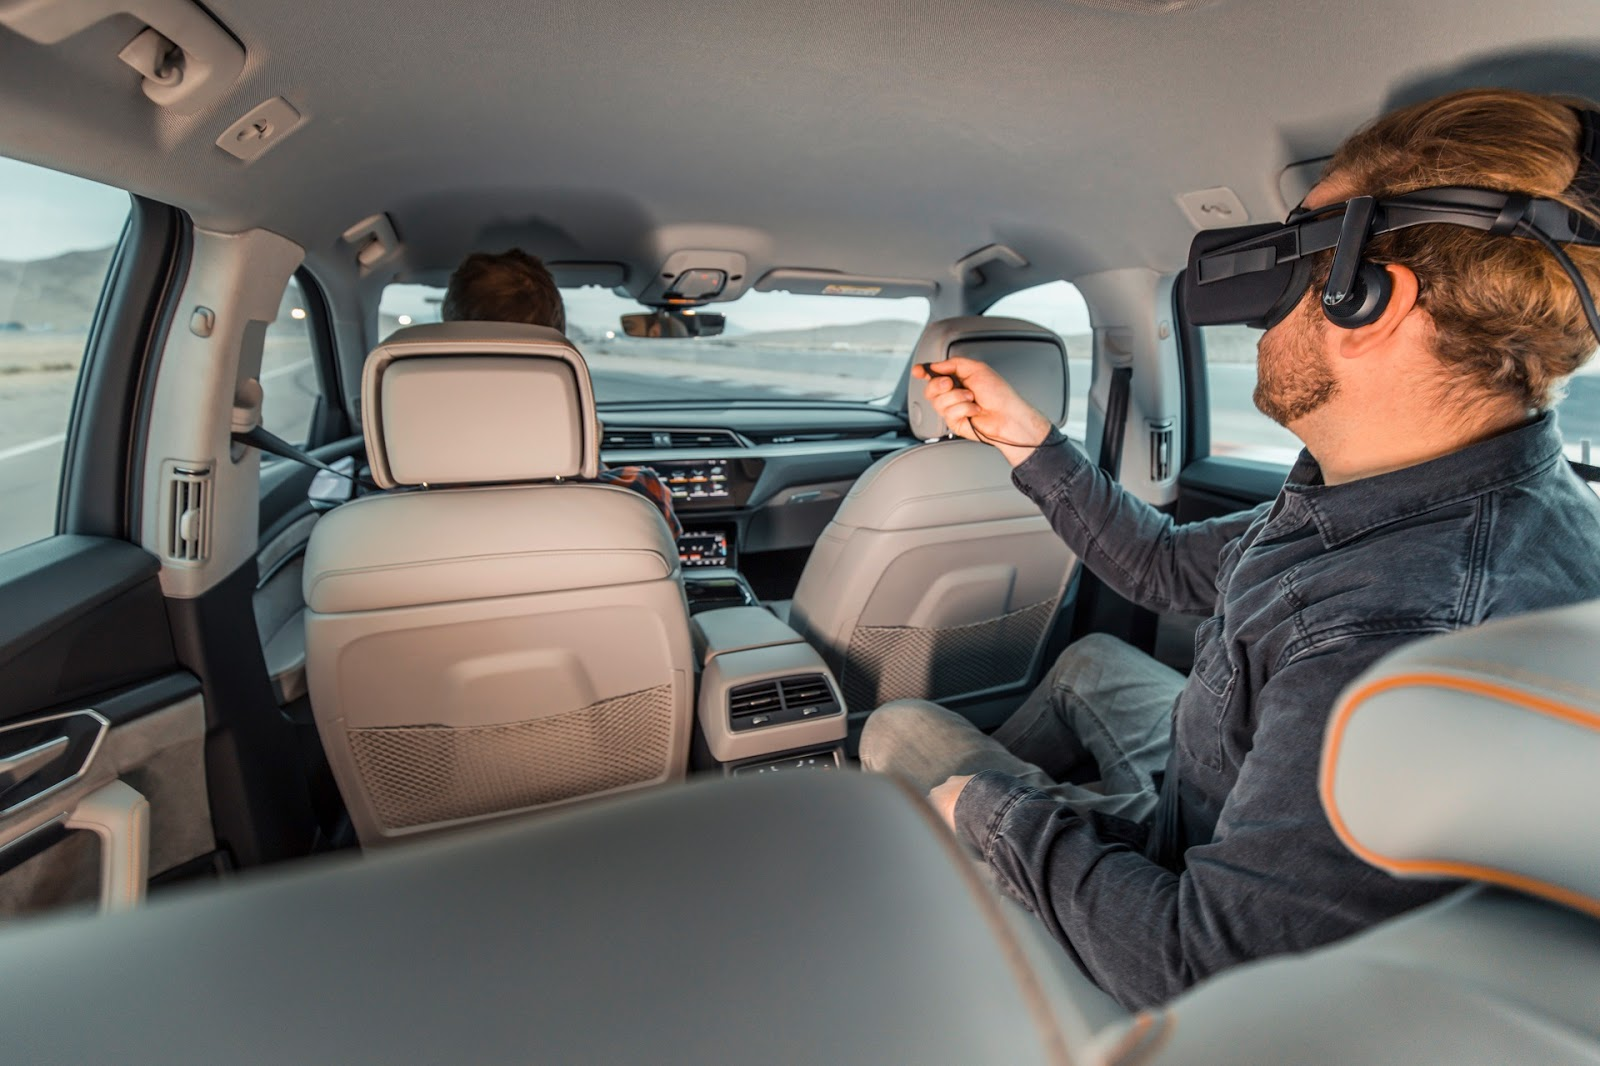 H2BAUDI2B25CE25A325CE25A425CE25972BCES 3 H Audi εξελίσσει VR videogames για το αυτοκίνητο! Audi, Electric cars, video, videos, βίντεο, Τεχνολογία